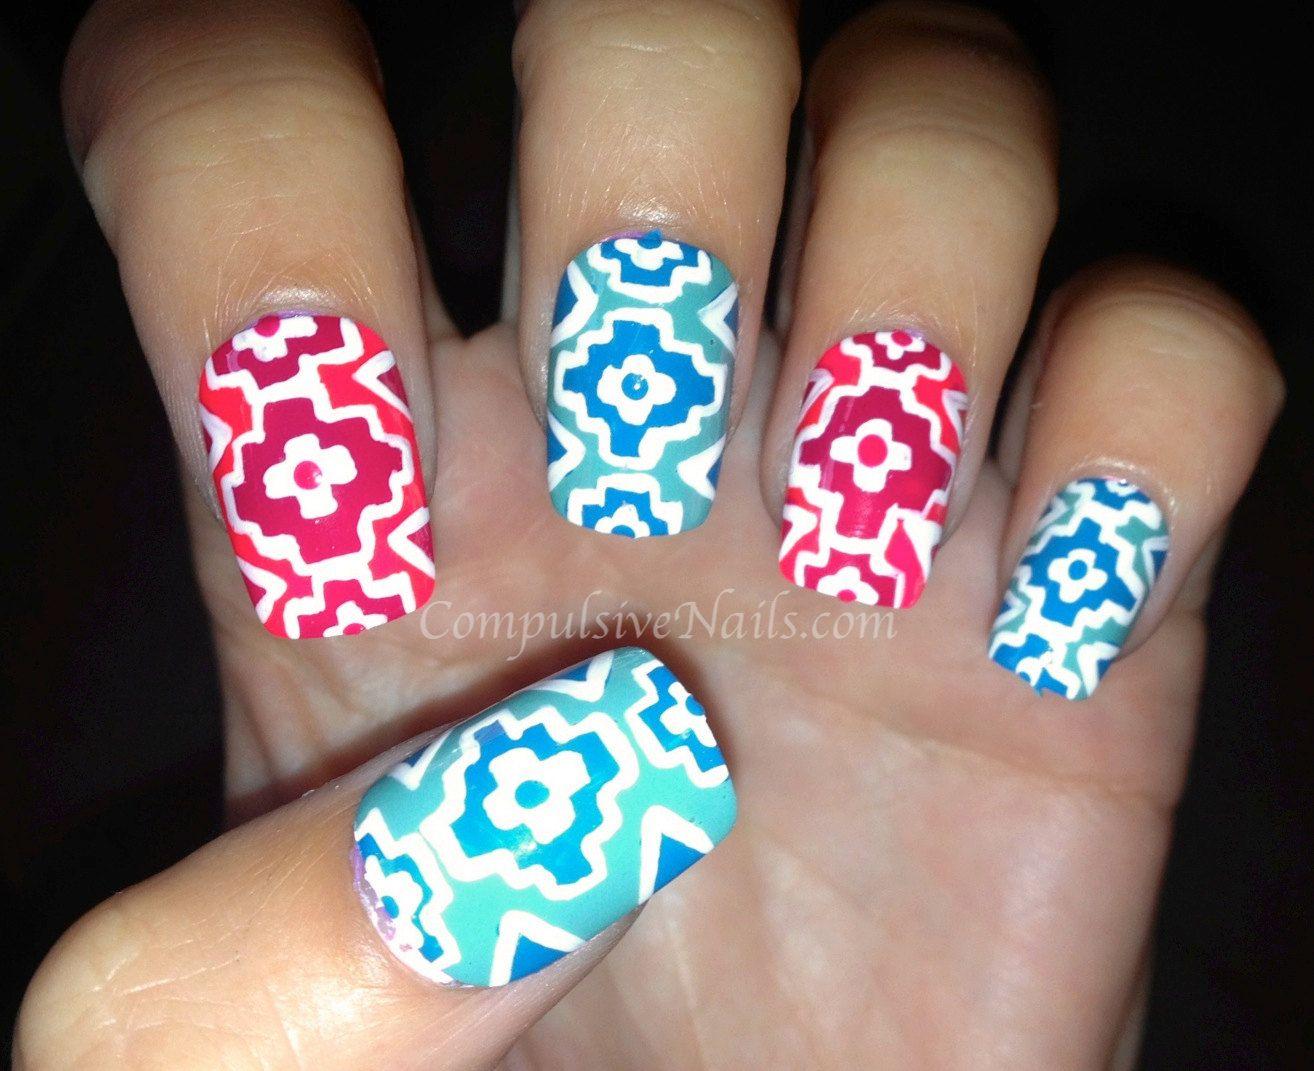 Navajo Inspired Tribal Fake Nails by CompulsiveNails on Etsy, $32.00 ...